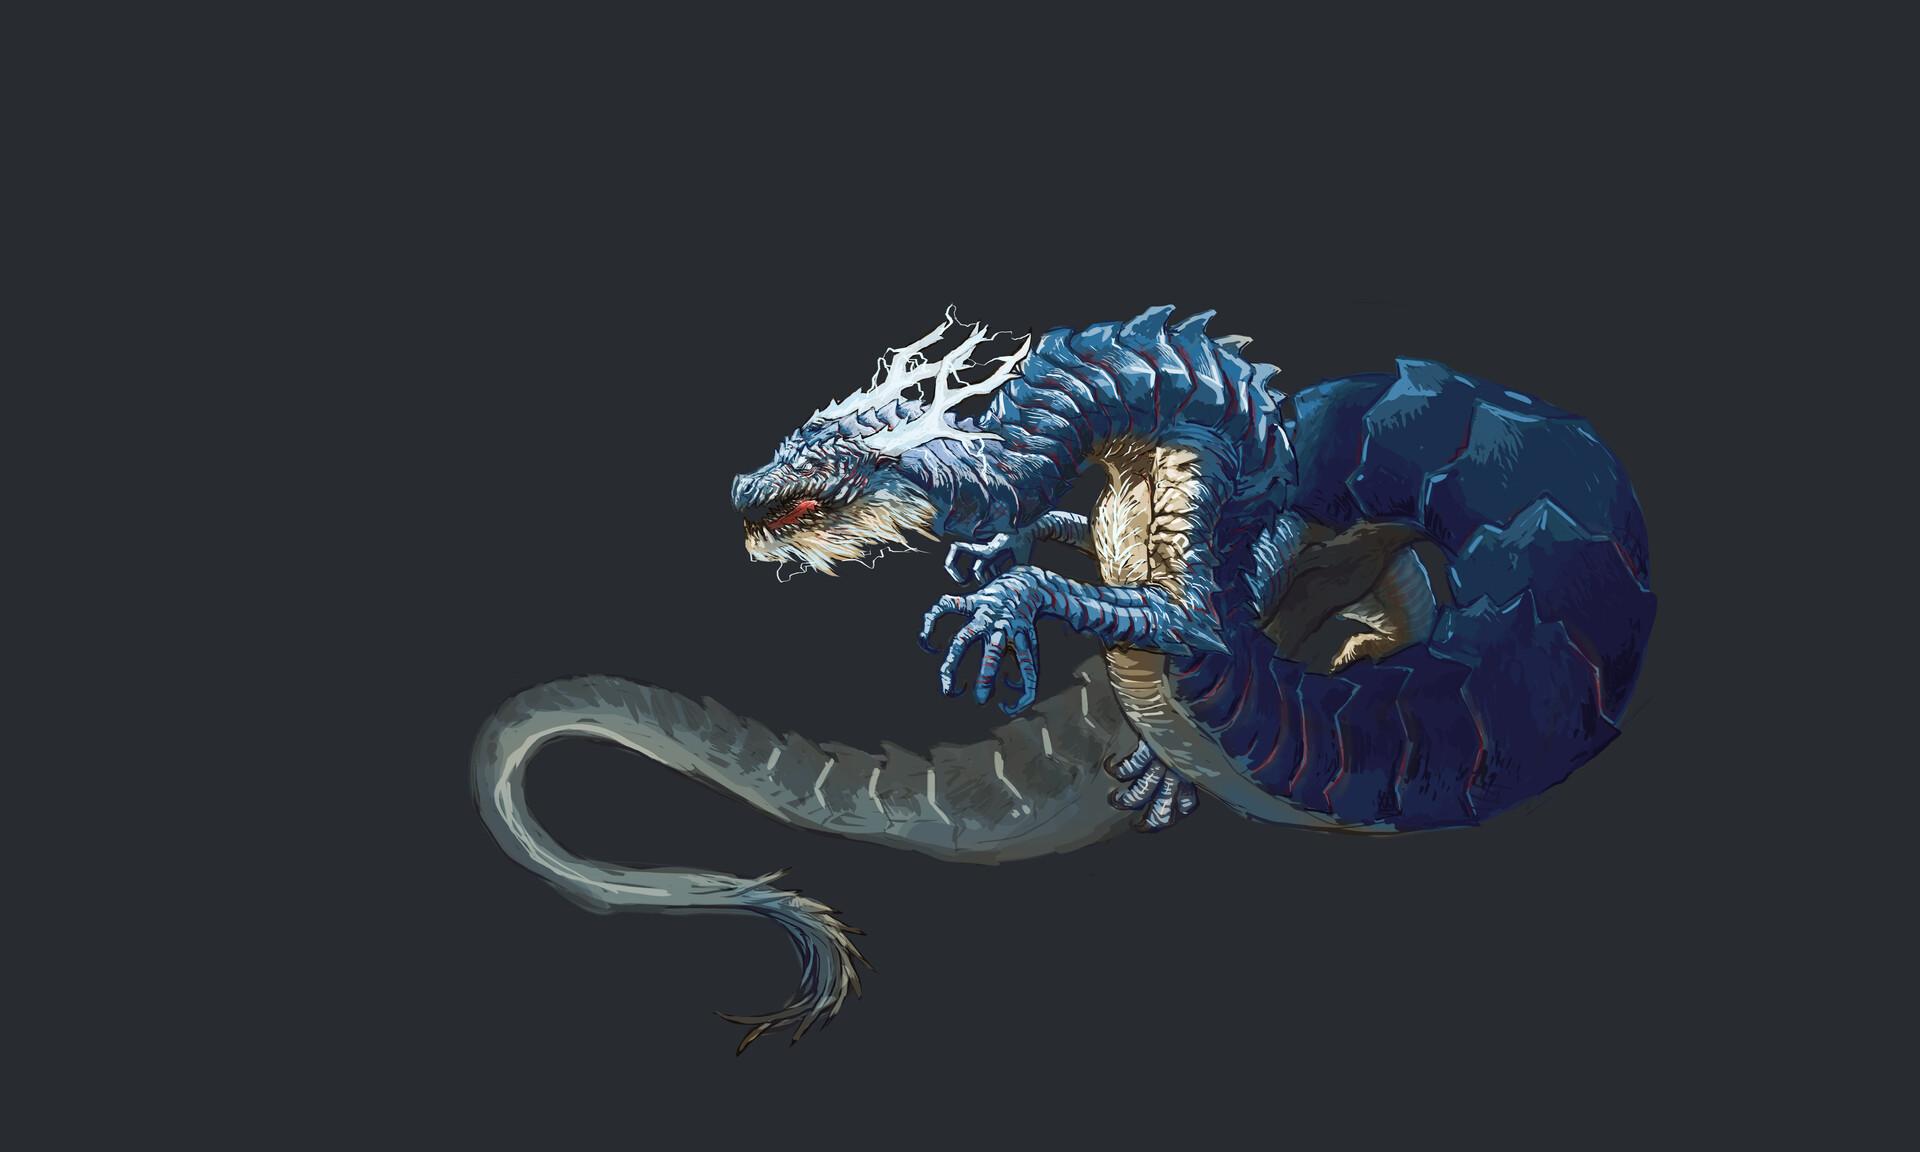 ArtStation - Aisan guardians, guardian of the west  Blue